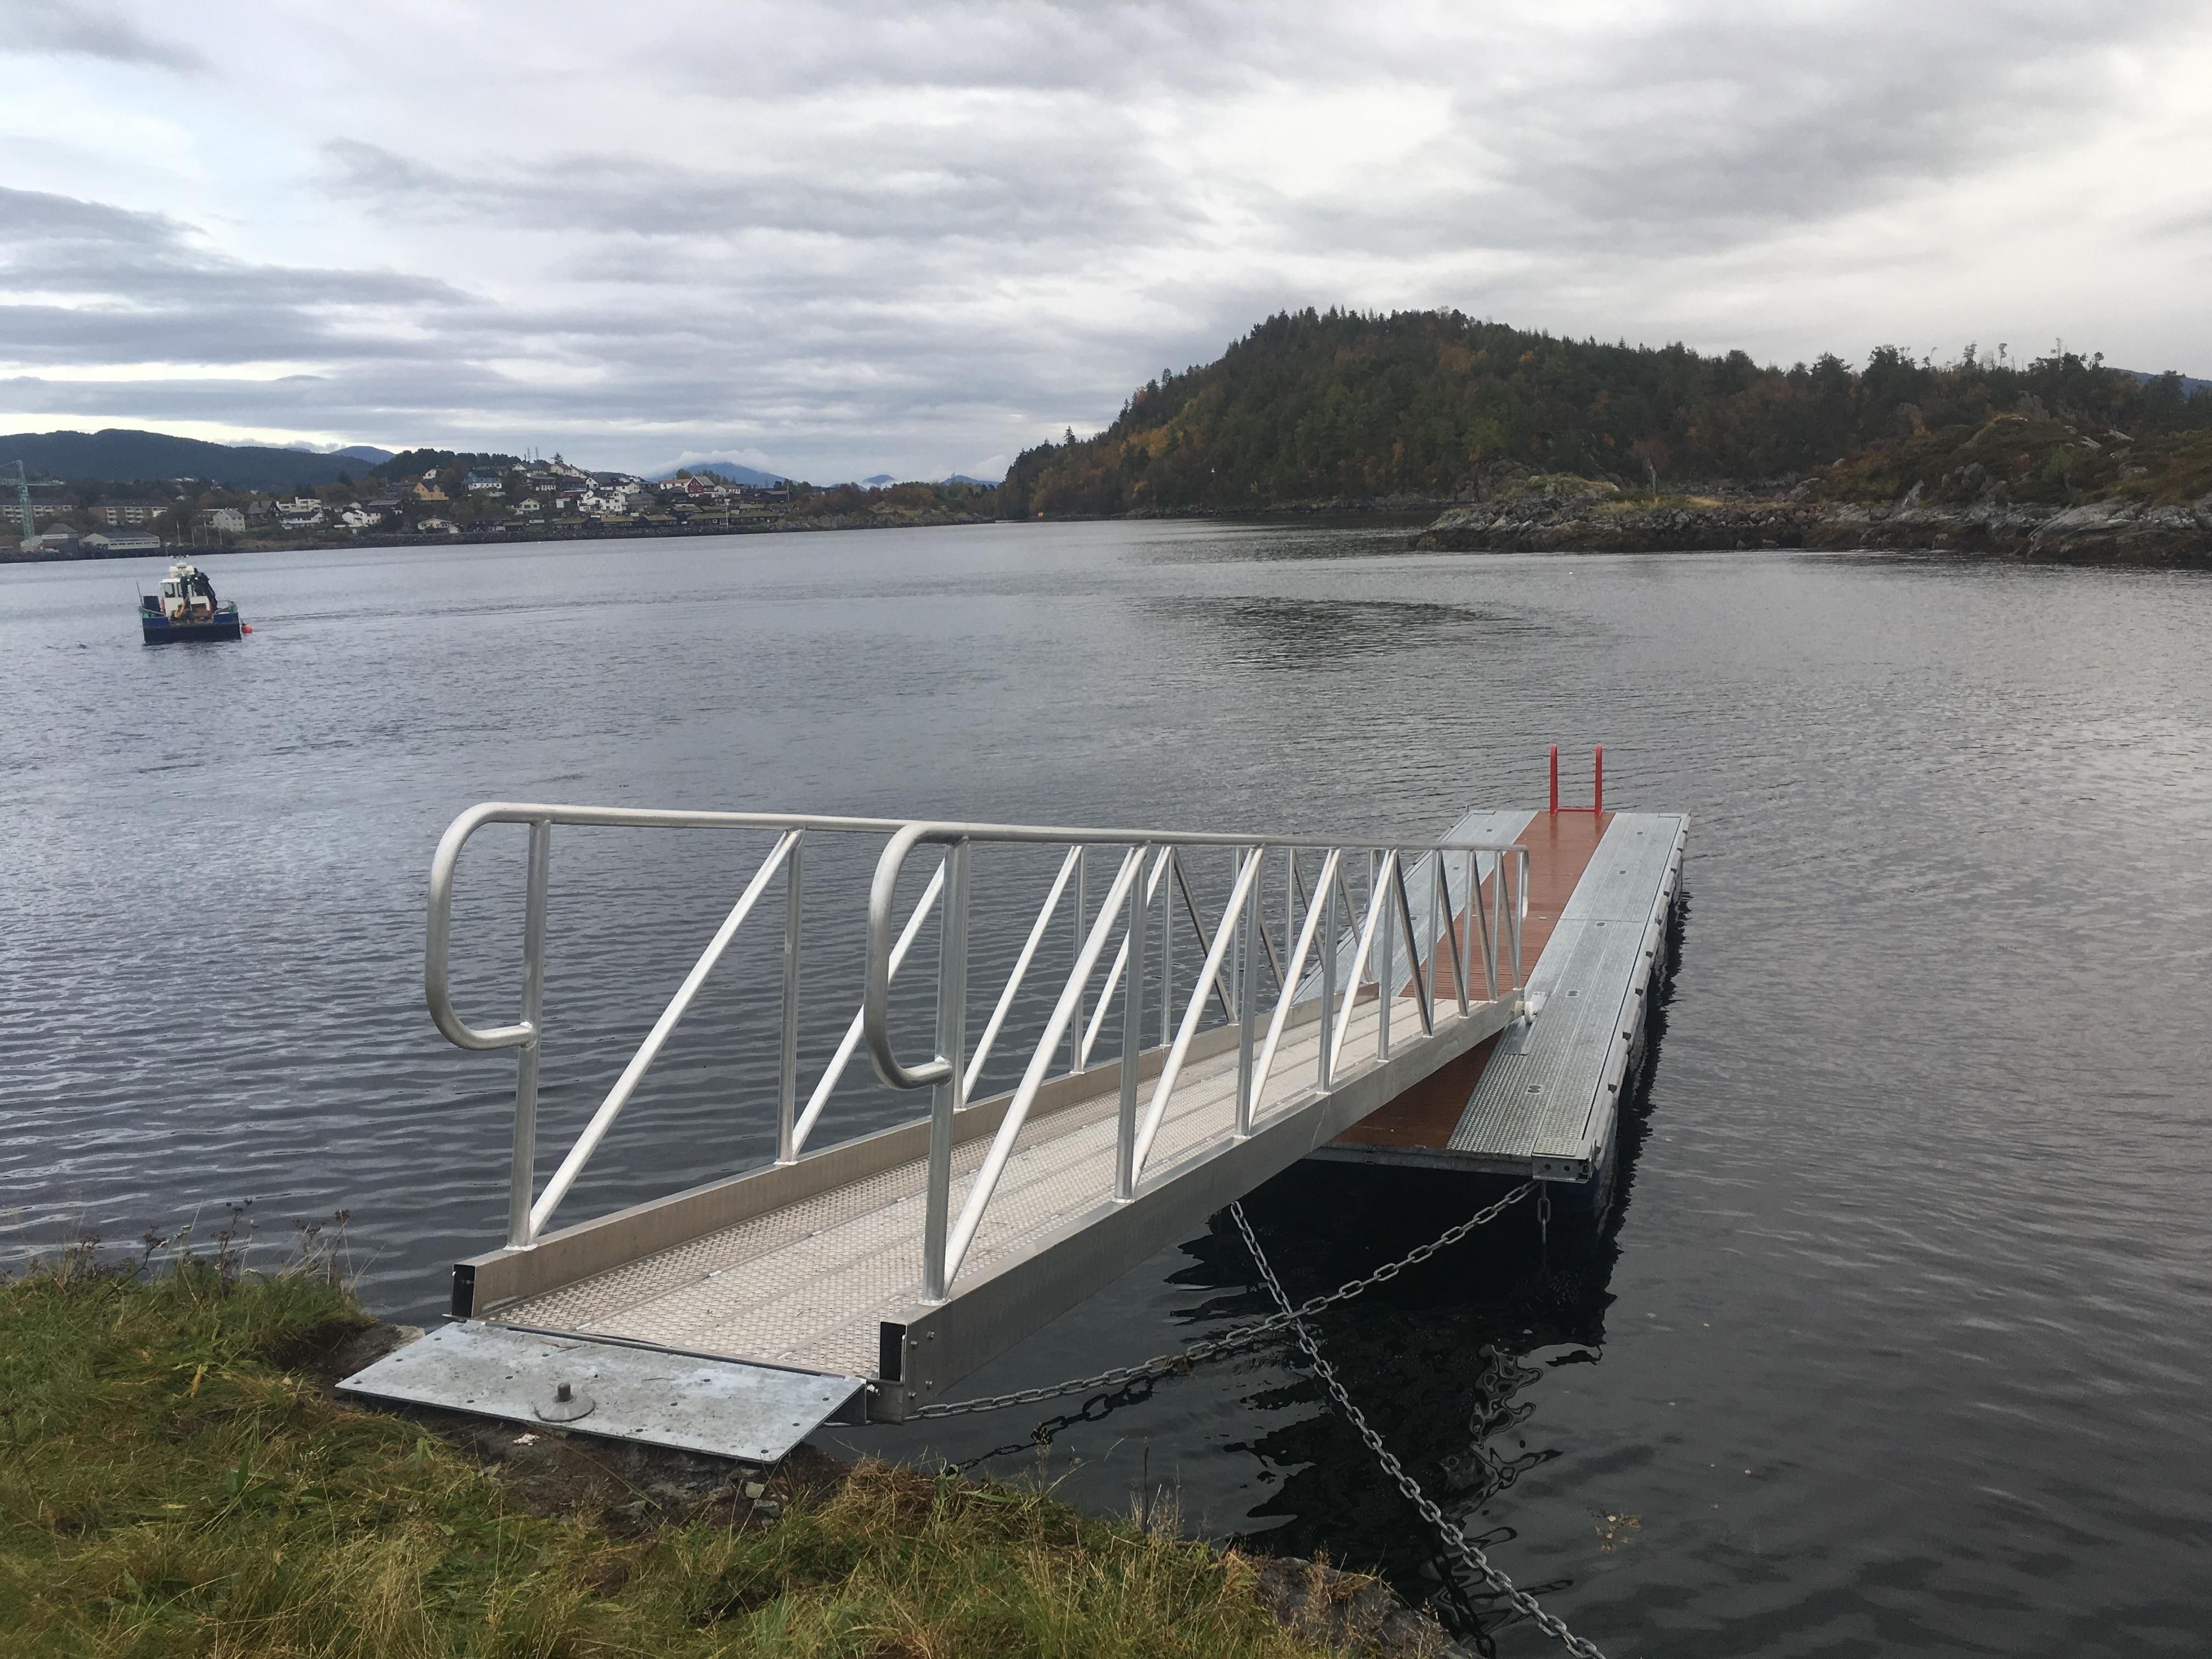 https://marinasolutions.no/uploads/Sunnmøre-Friluftsråd_Hundsvør-3.JPG